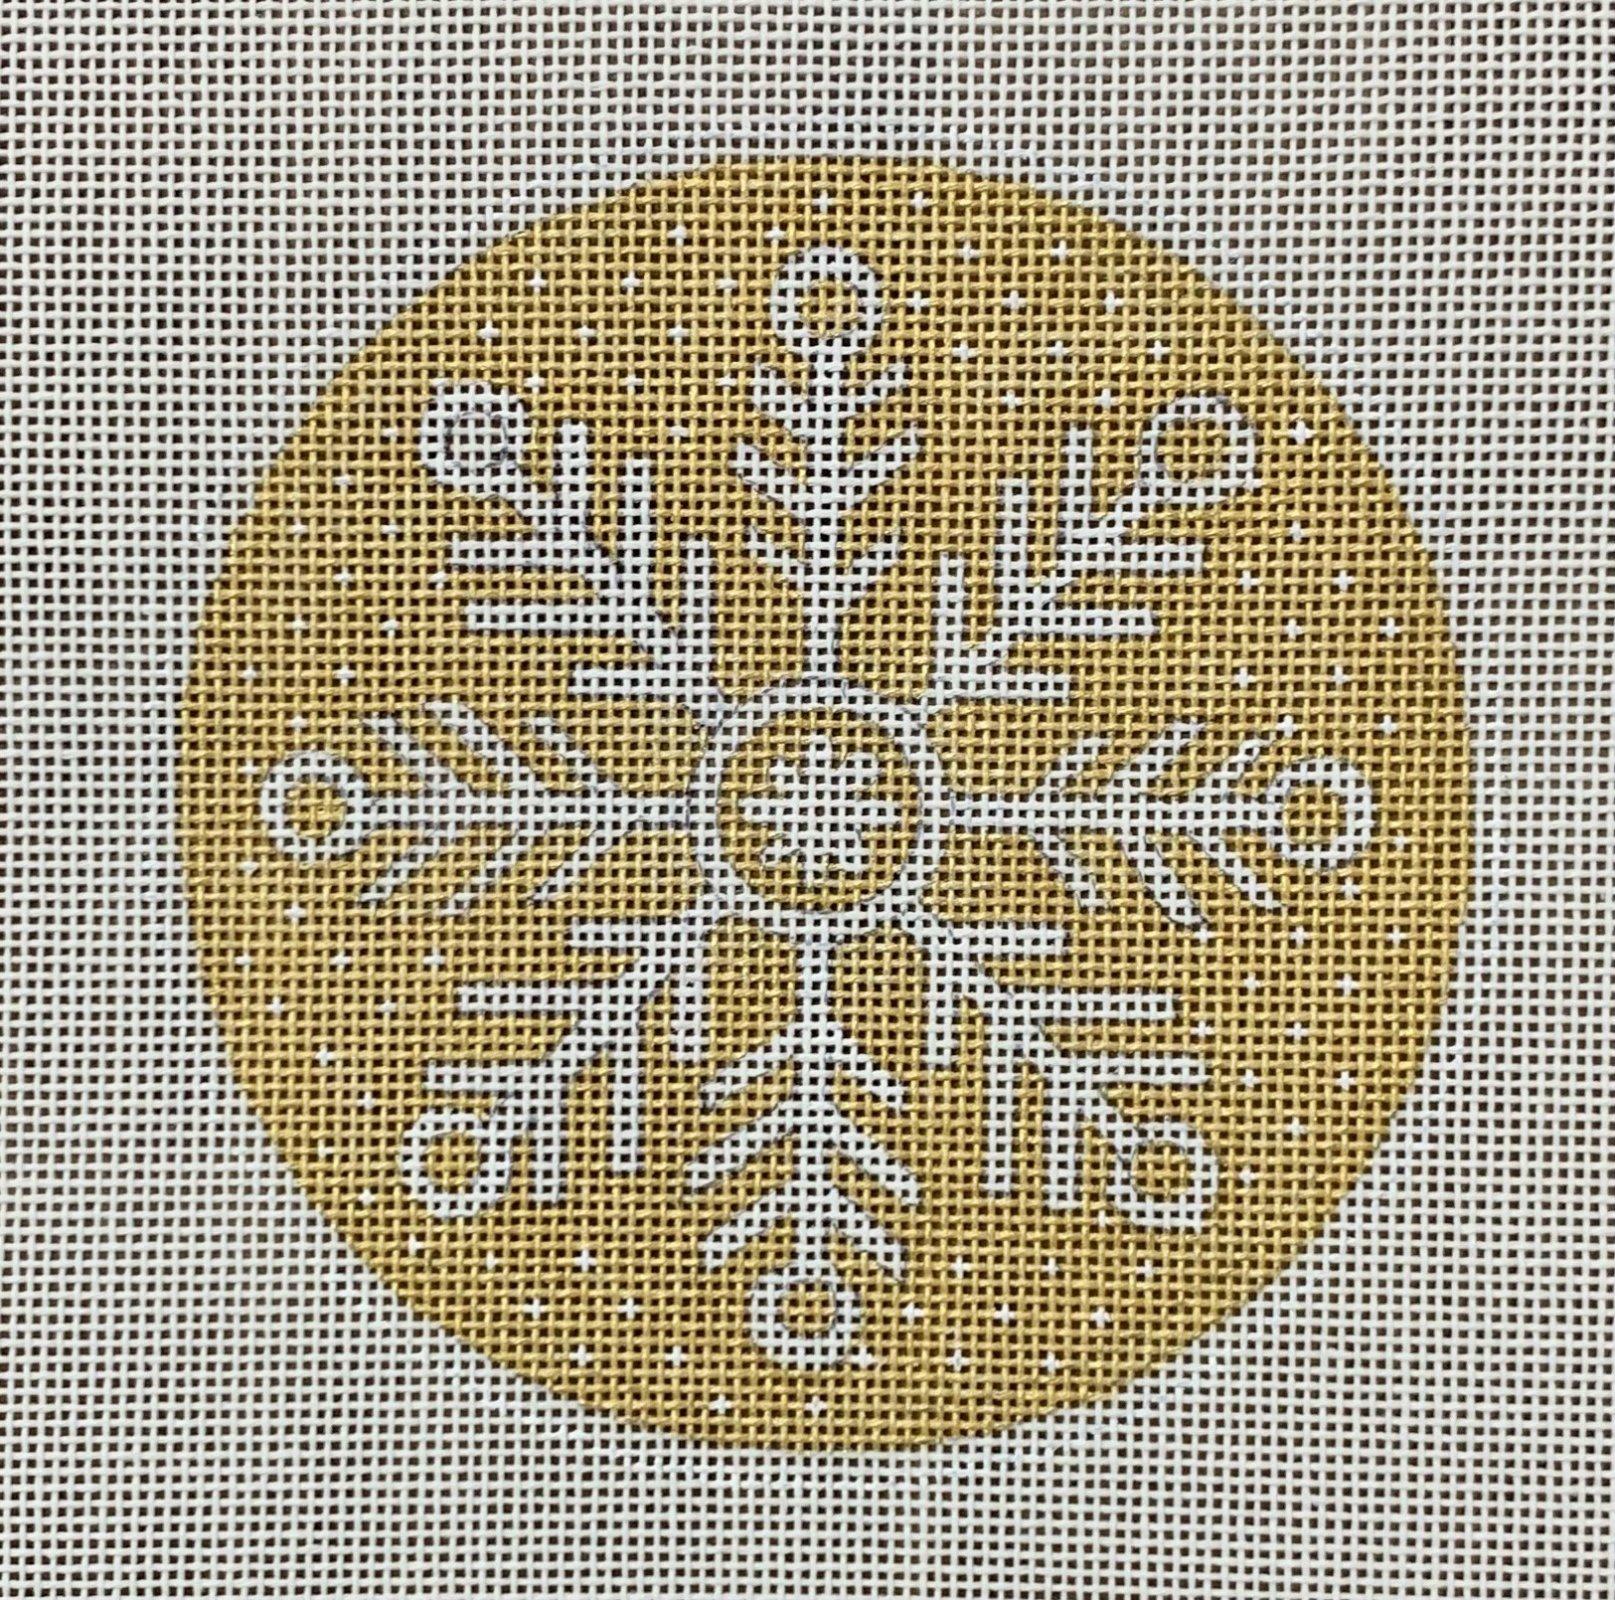 Gold Snowflake Ornament 1